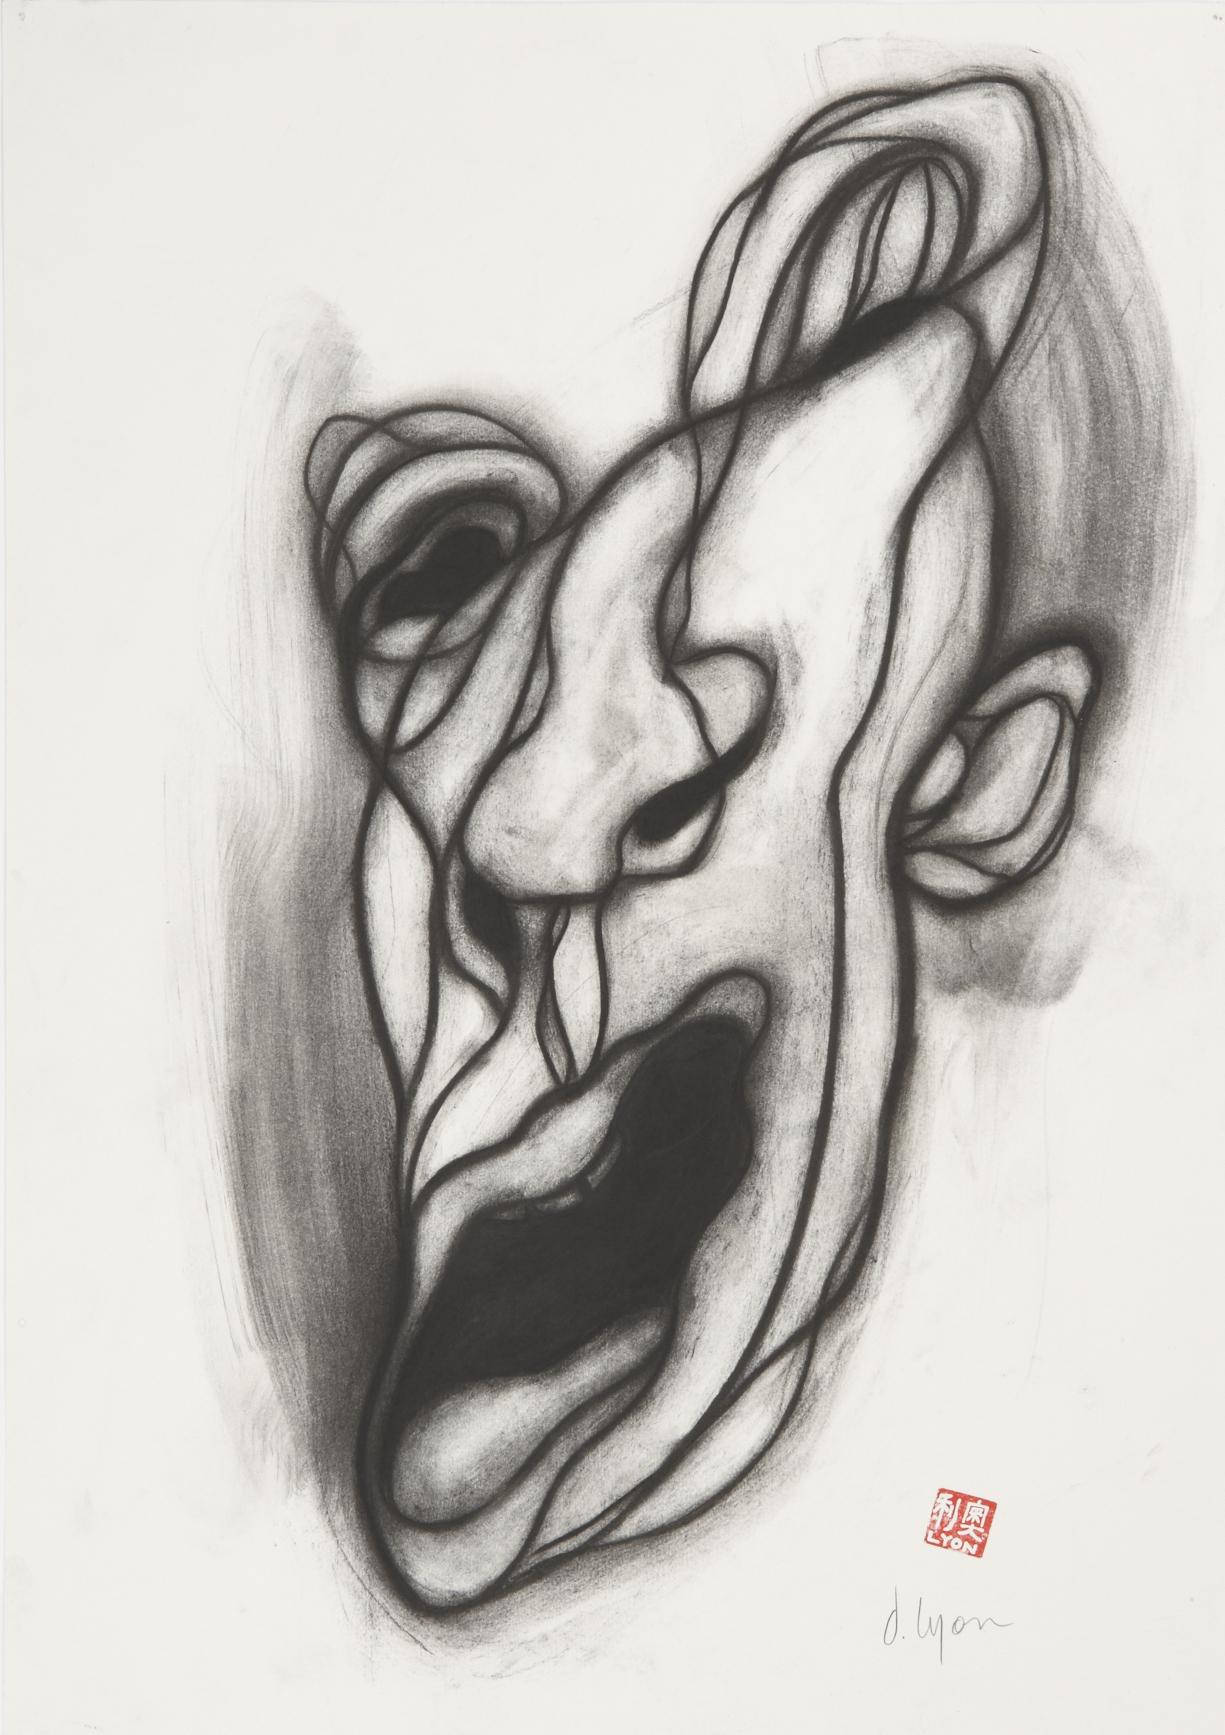 Portrait Mask Caricature 4 - 015 - 150dpi.jpg